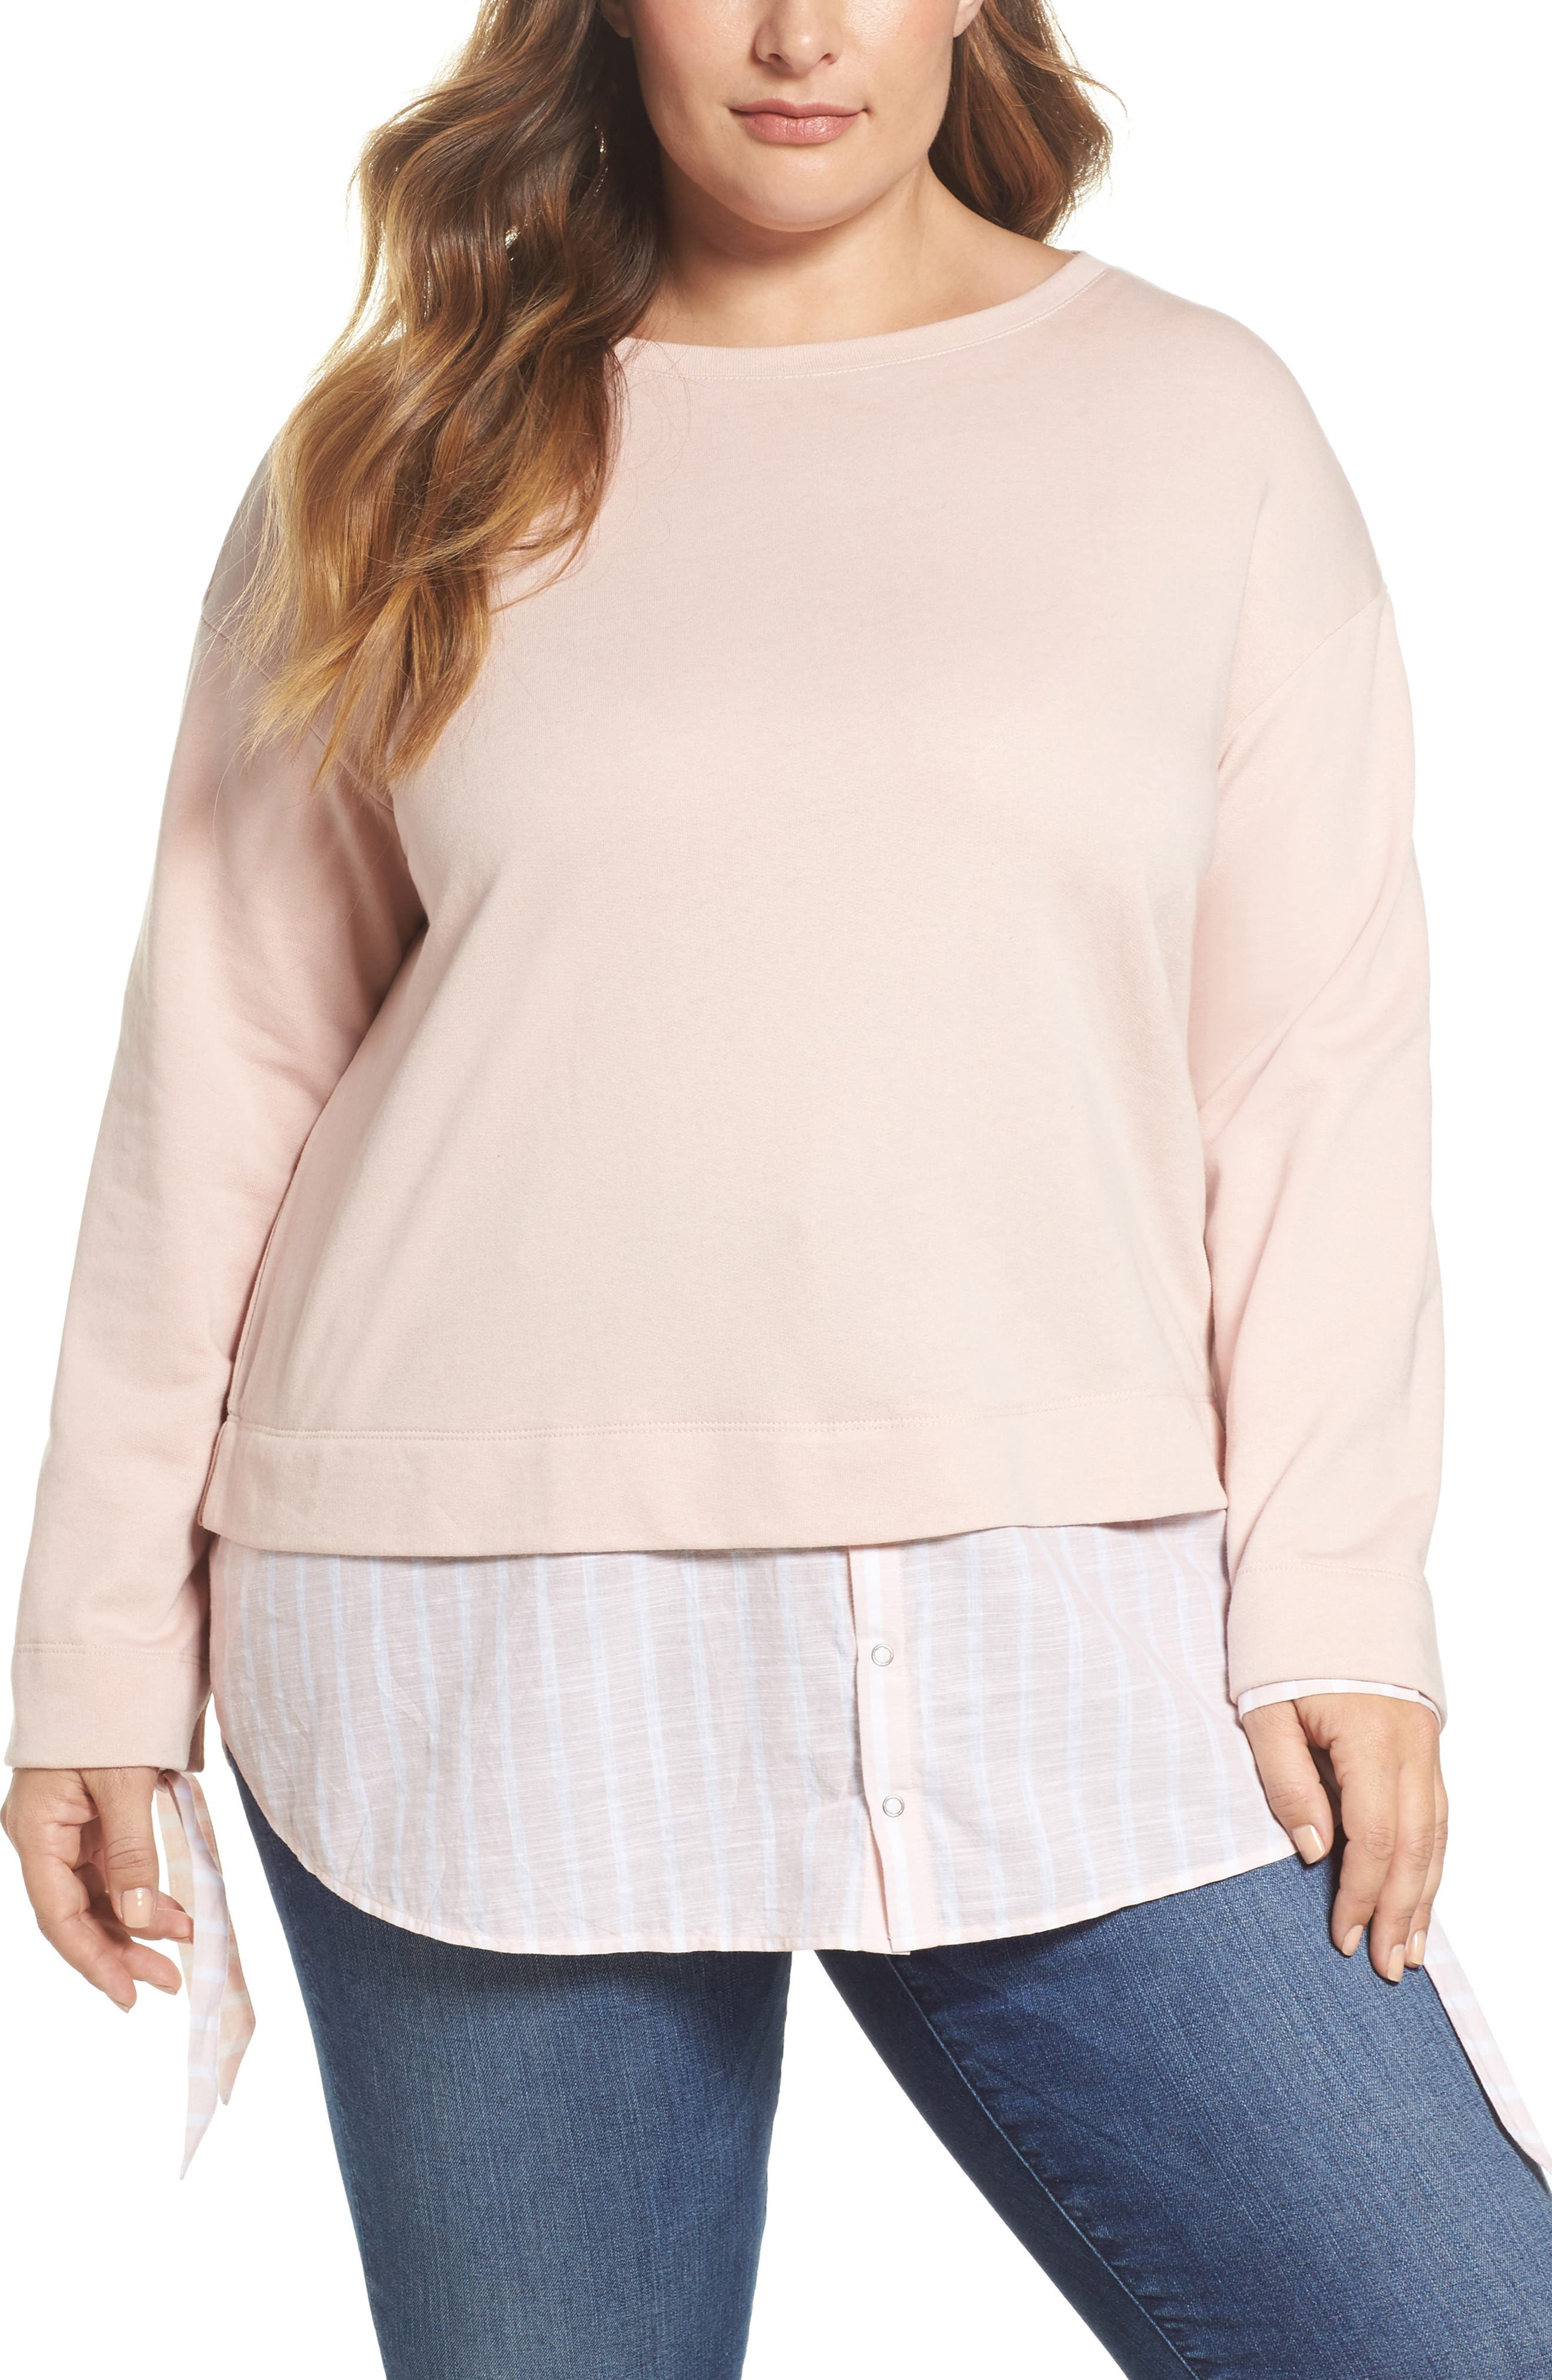 Woven Hem Sweatshirt,                             Main thumbnail 1, color,                             Pink- Stripe Colorblock